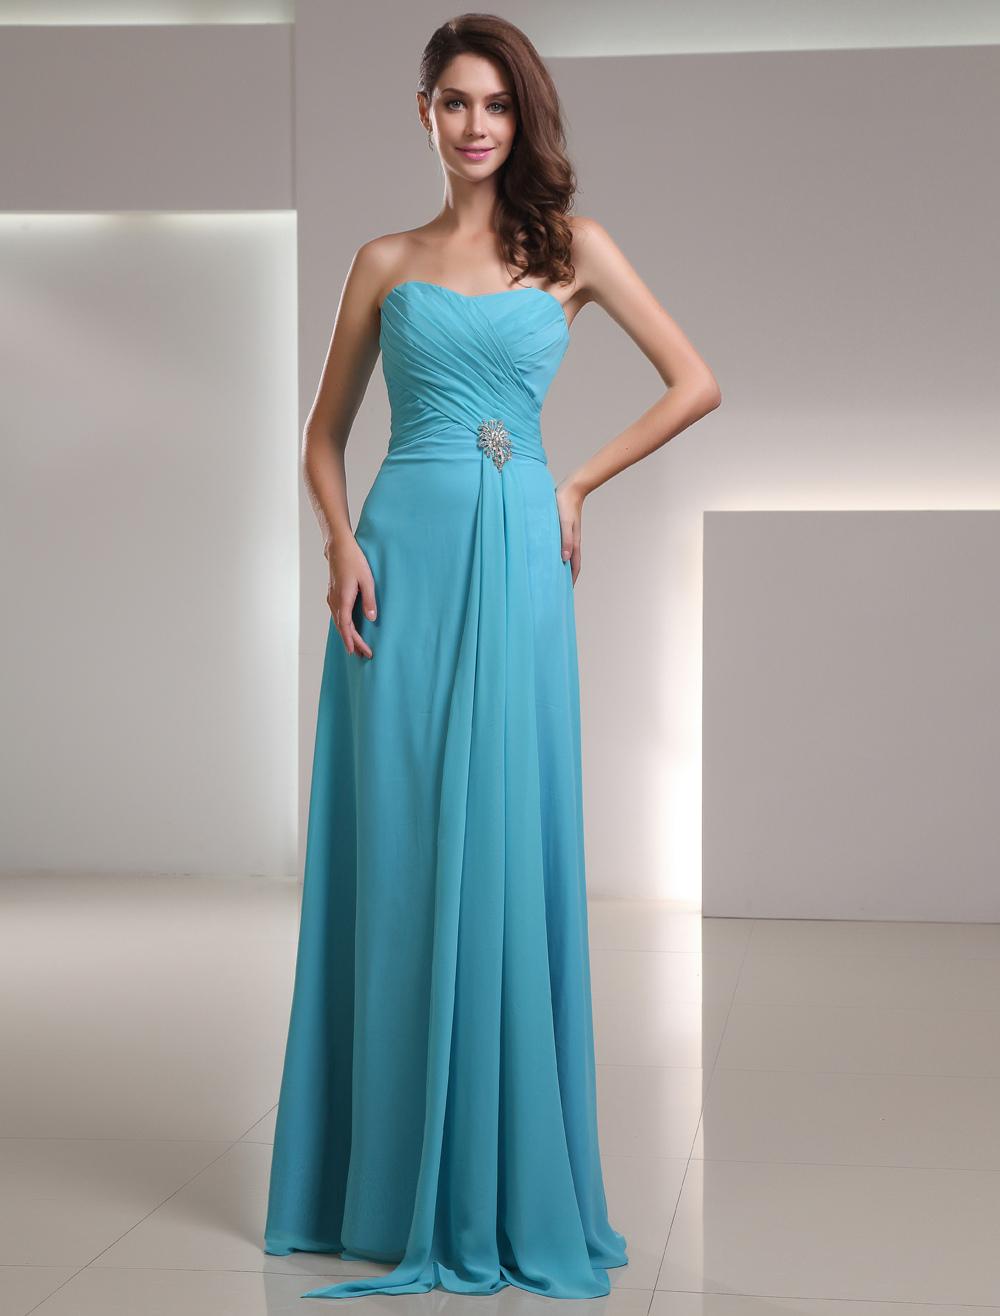 Buy Long Bridesmaid Dress Chiffon Aqua Sweetheart Strapless Floor Length Wedding Party Dress for $108.89 in Milanoo store